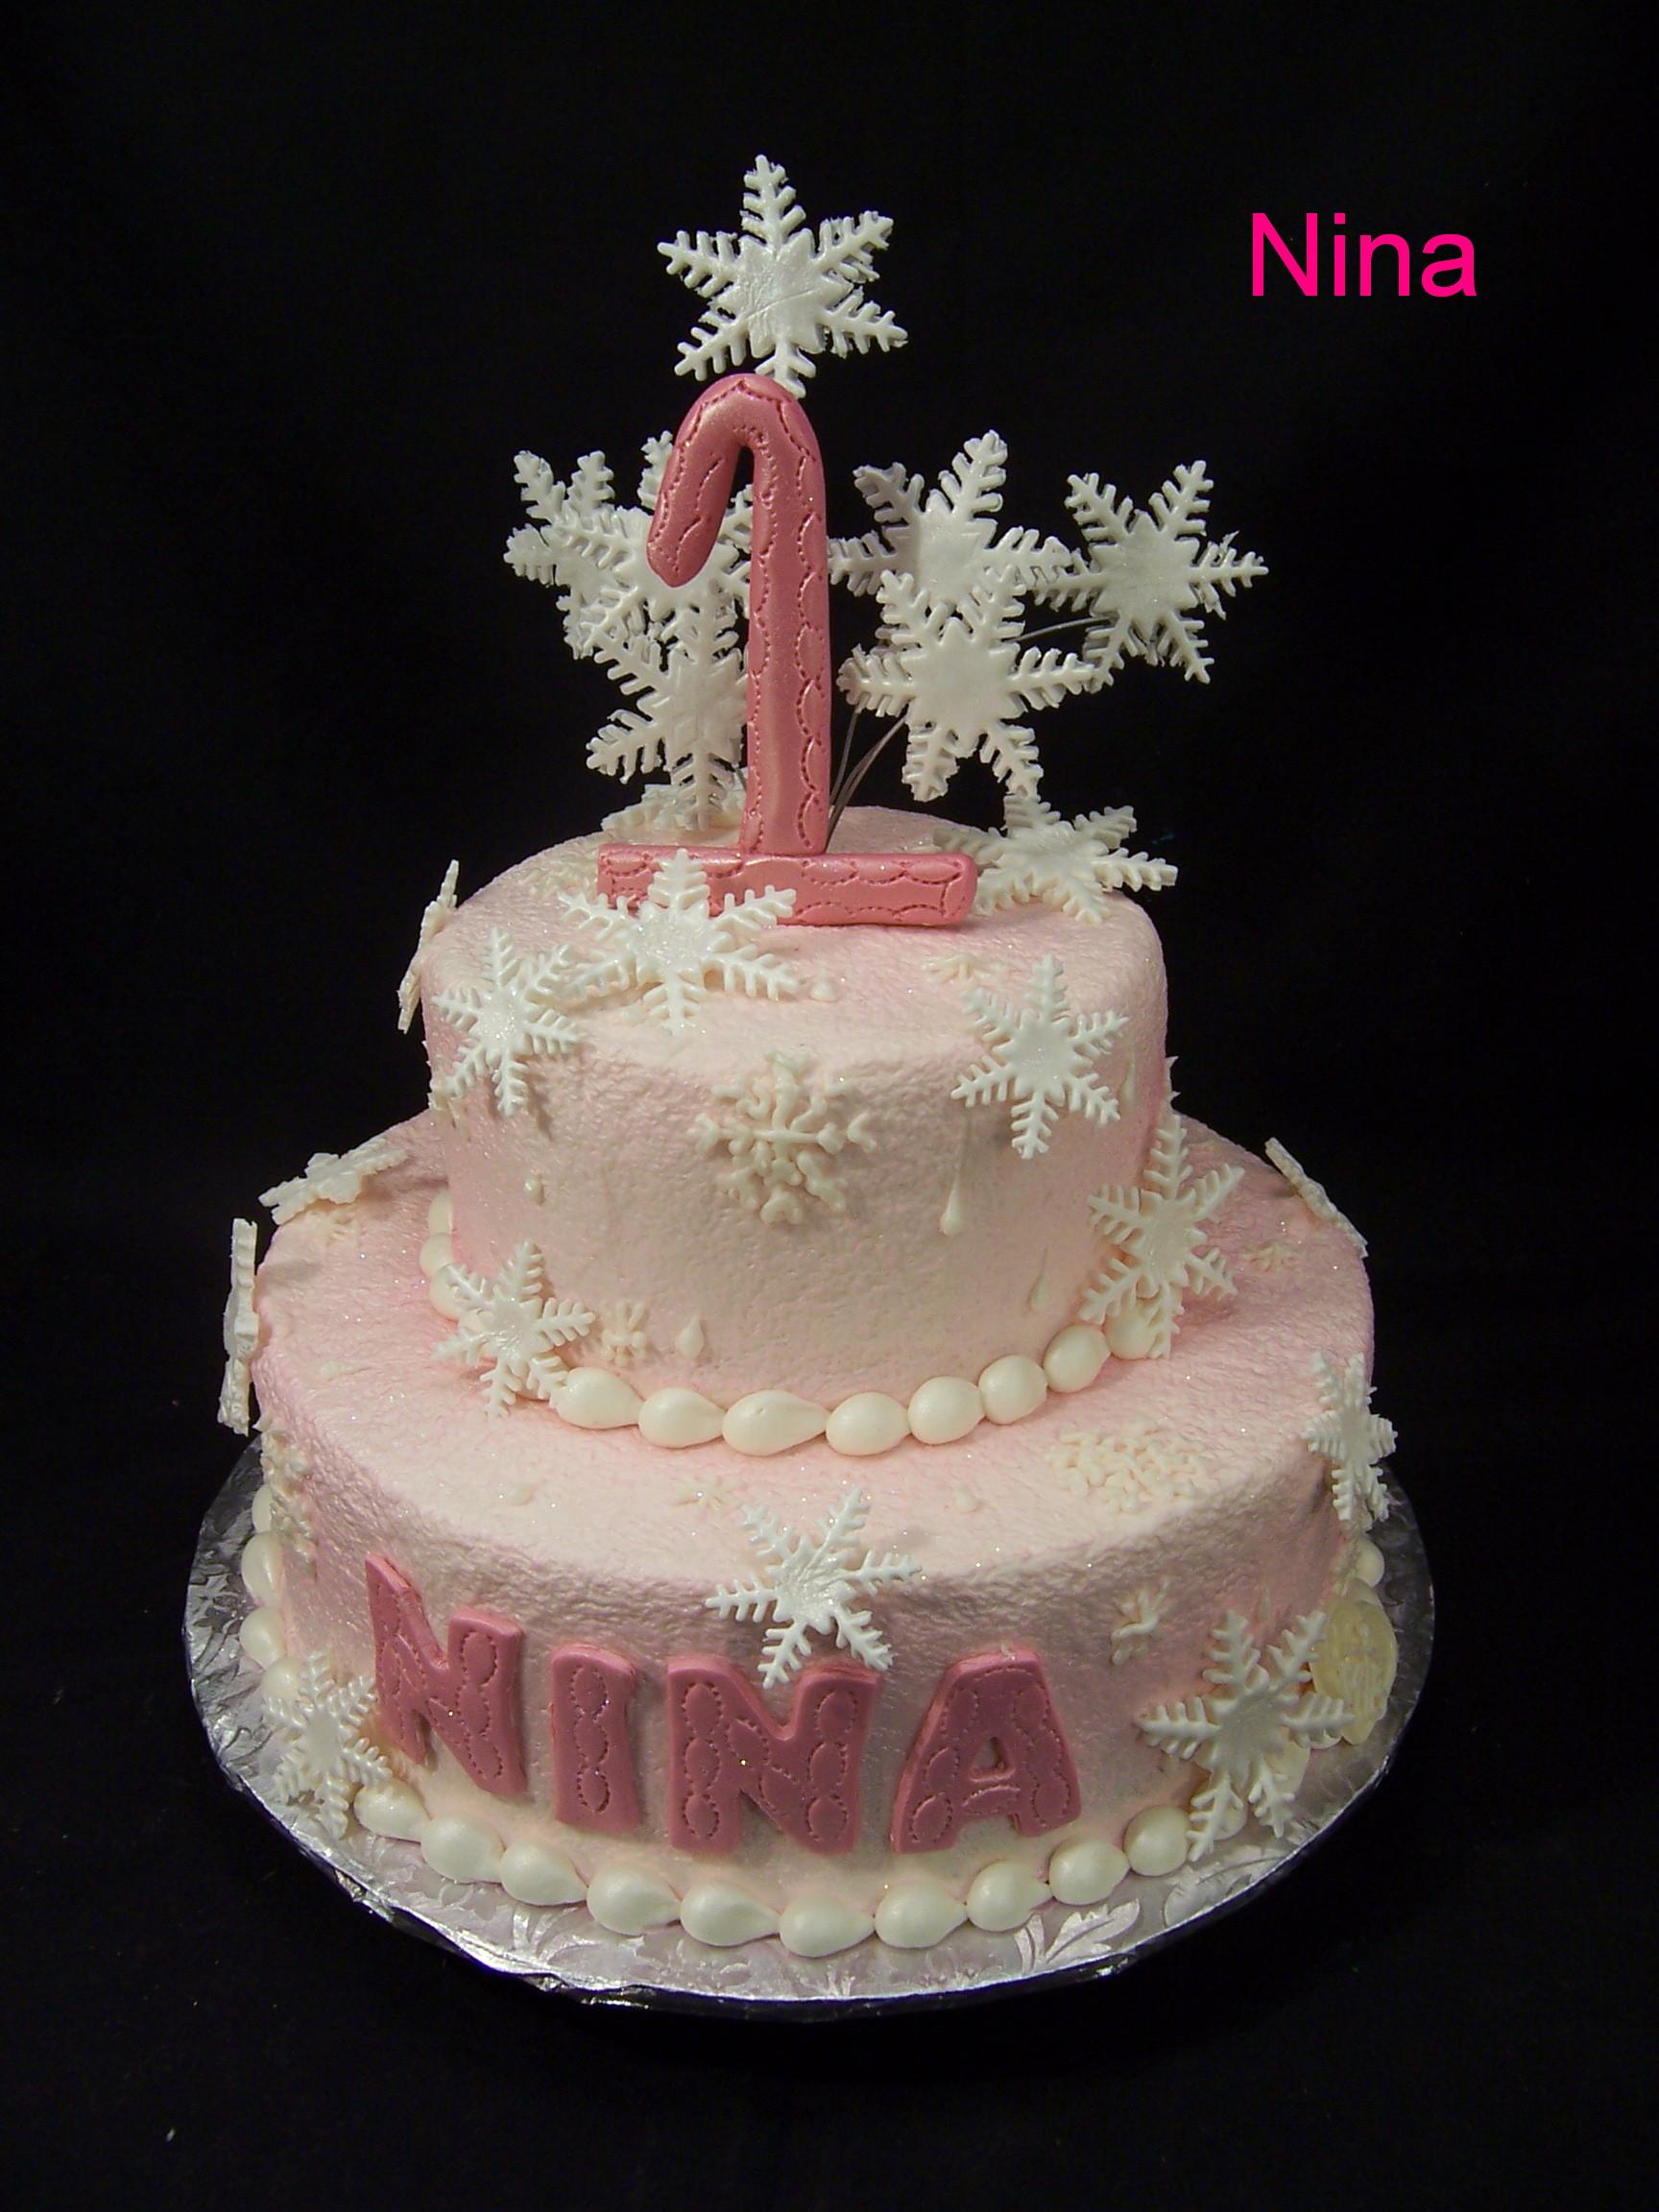 Sams Club Birthday Cake Ideas And Designs